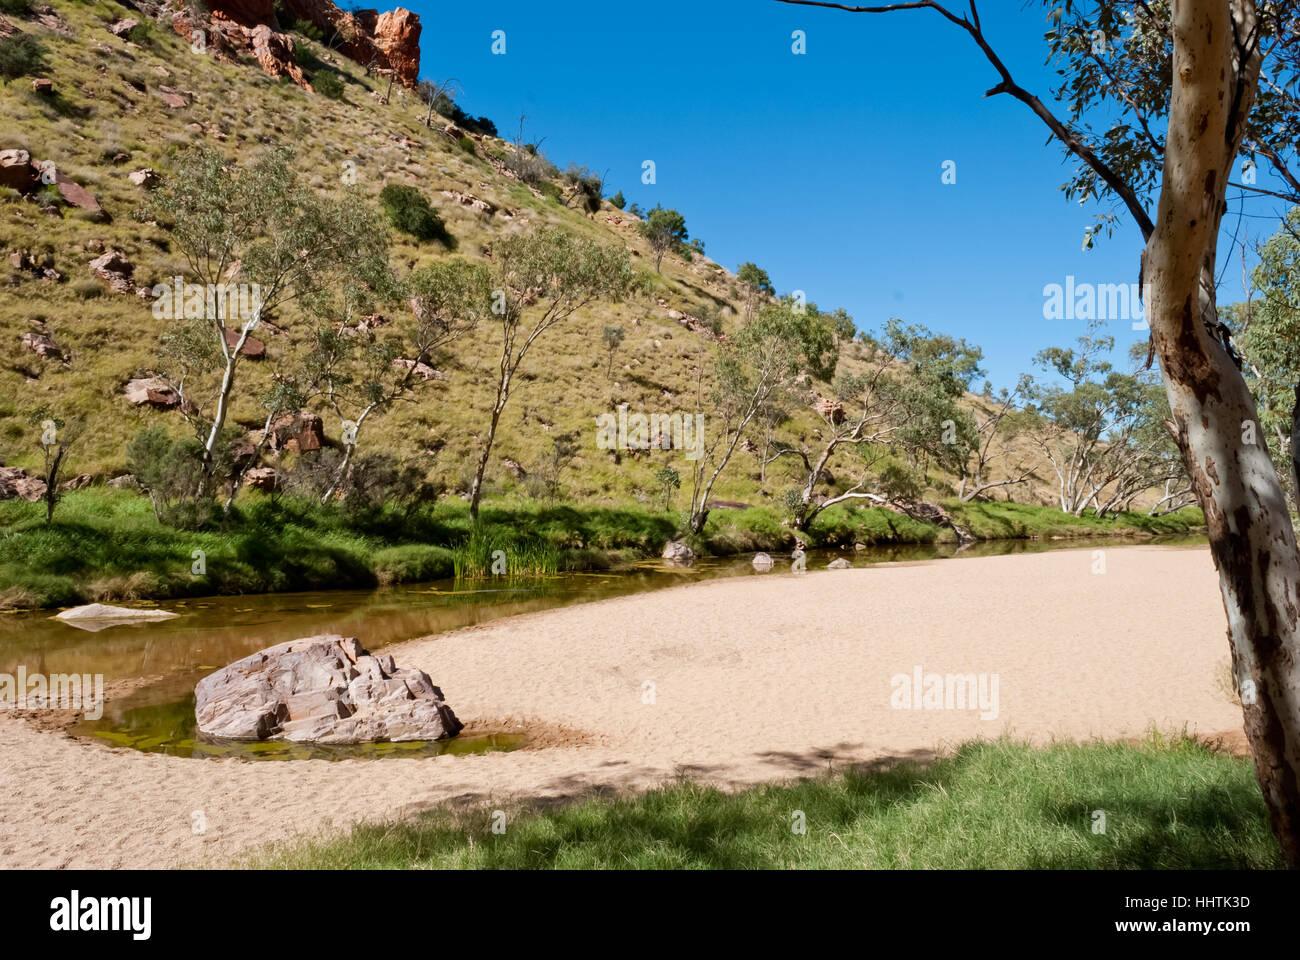 Wild nature at Simpsons Gap, Northern Territory, Australia - Stock Image